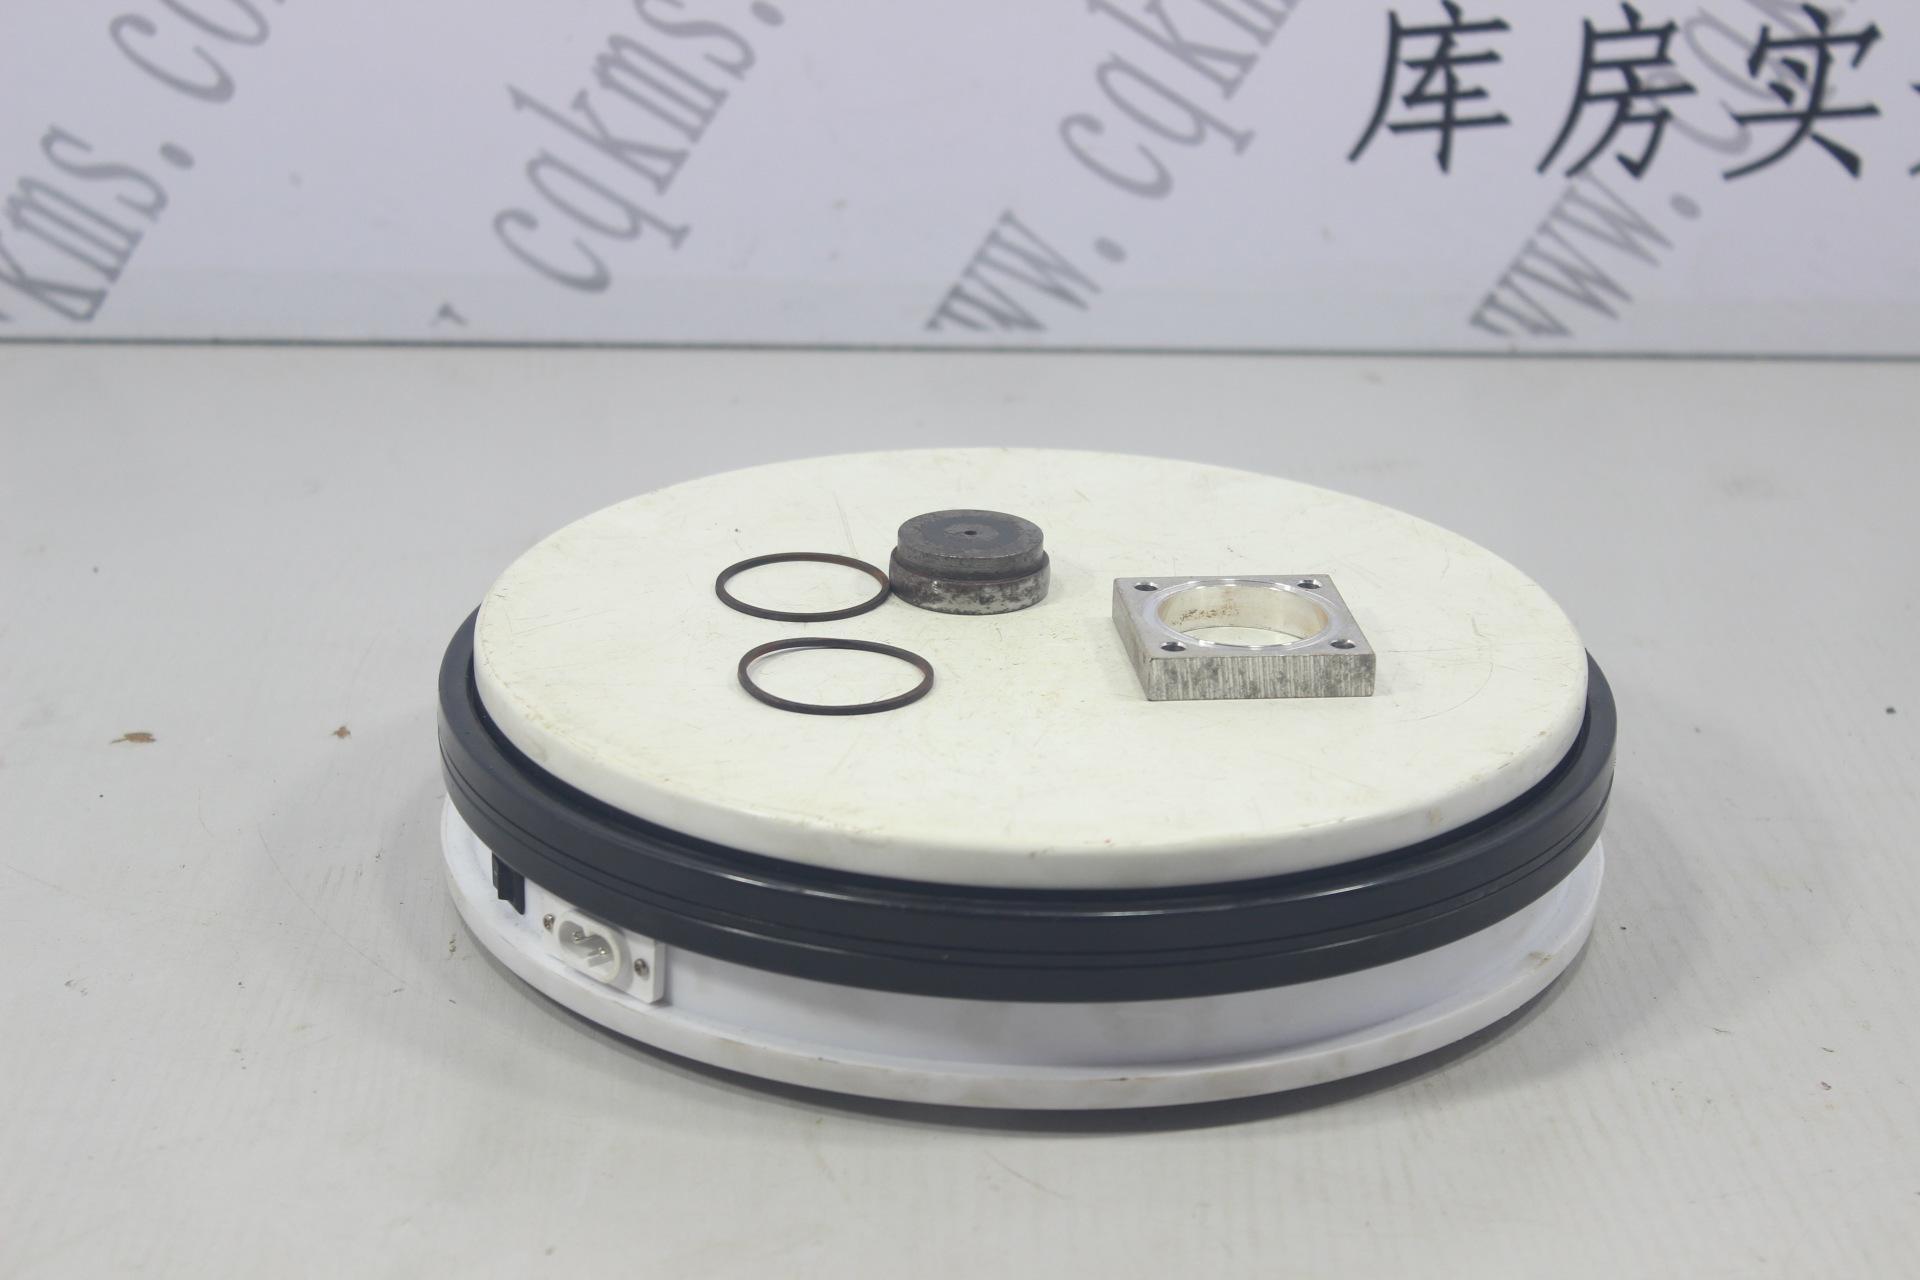 kms00747-3034452-电磁阀阀体-用于N14康明斯发动机-N14-参考规格底长宽4.6cm,底孔径0.4cm,几个孔径分别0.9cm,0.9cm,0.7cm-参考重量0.15kg-0.15kg图片1